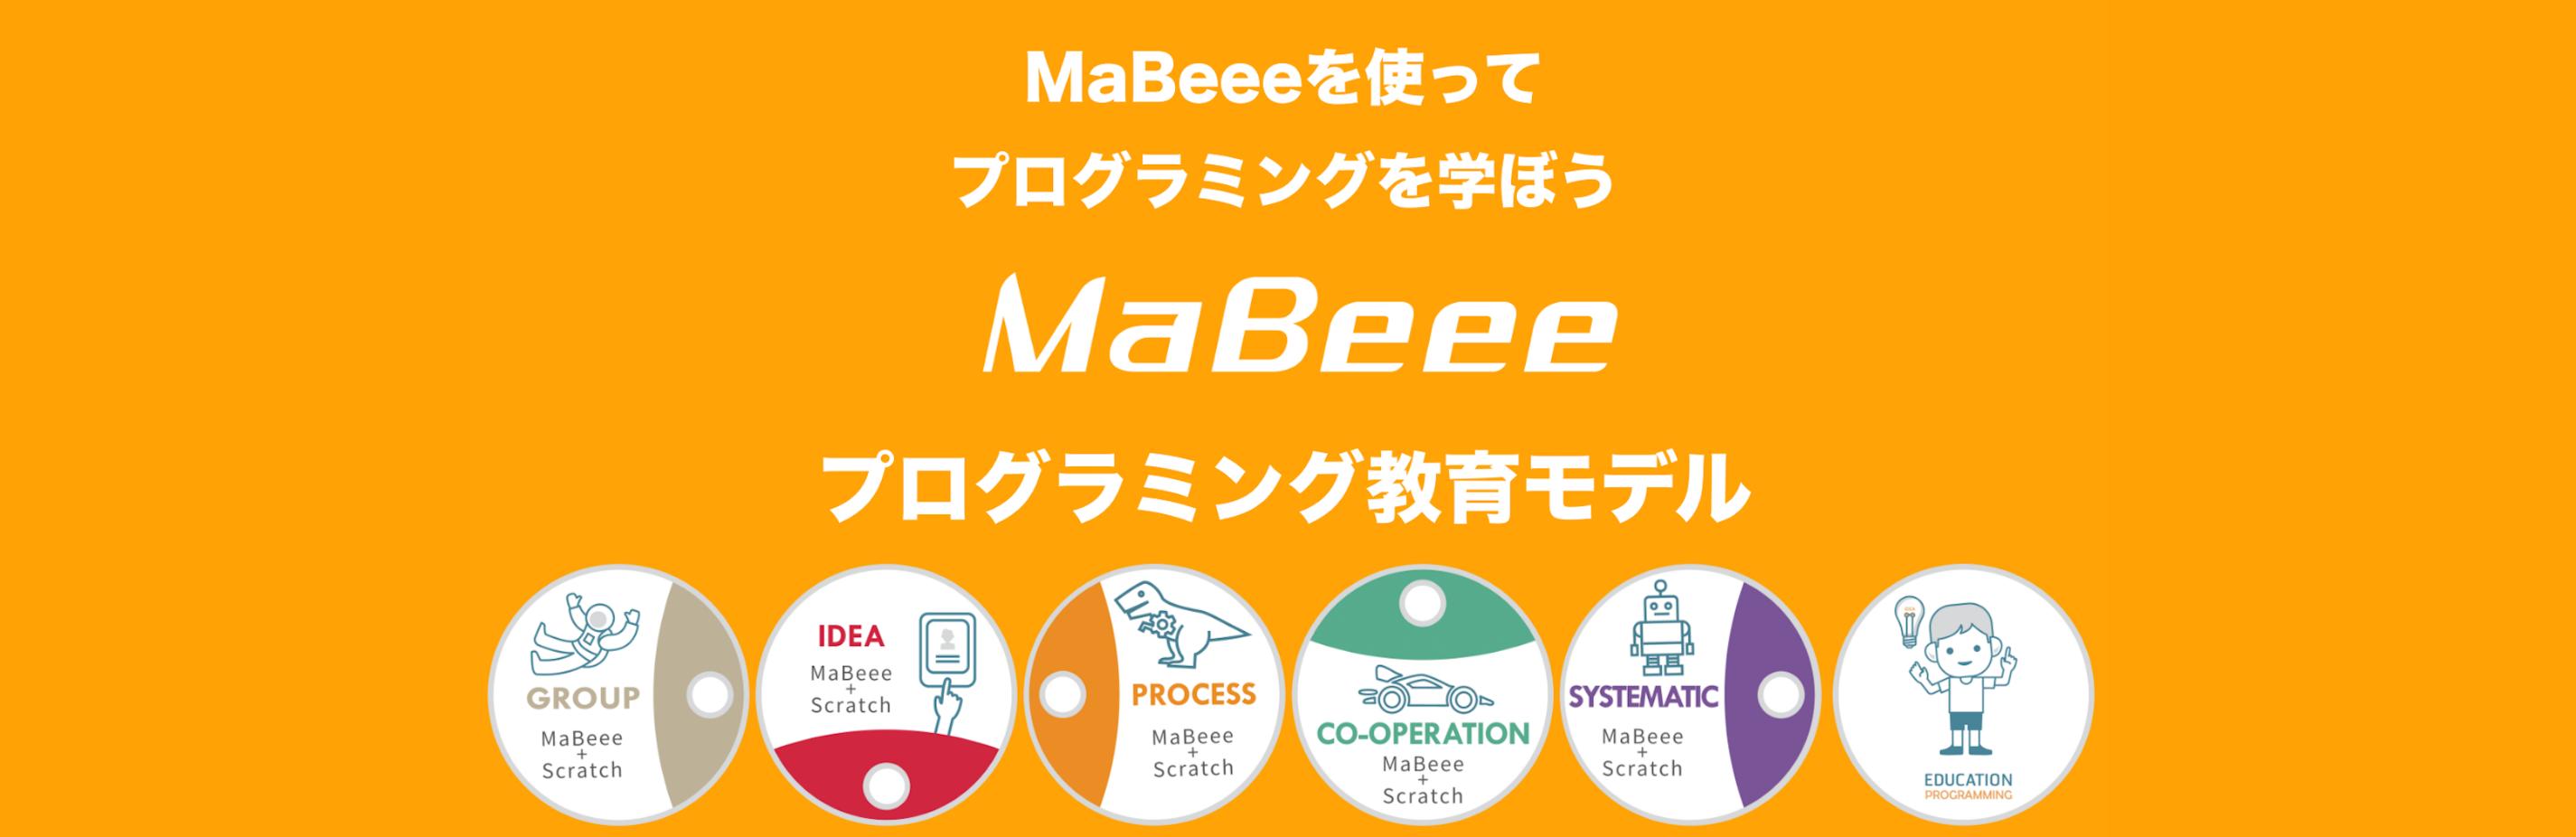 Mabeee プログラミング教育モデル(Scratchモデル)